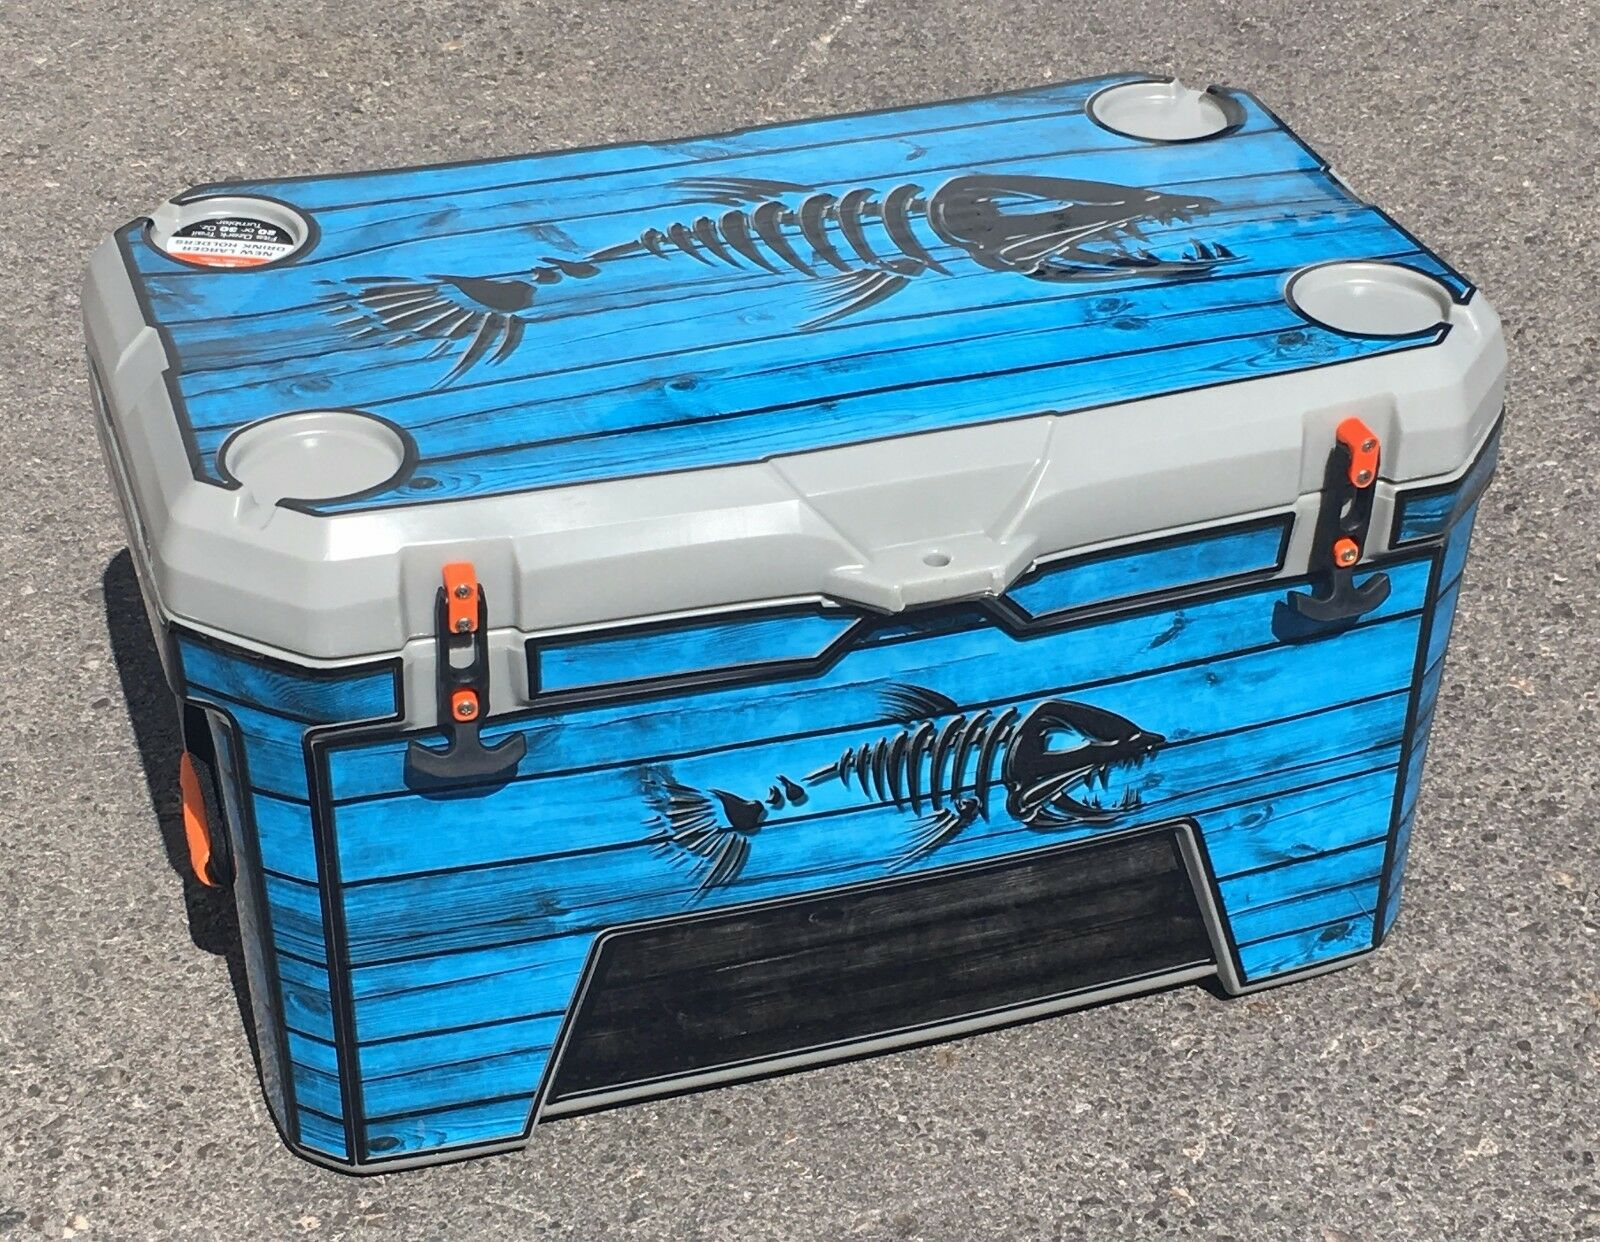 USATuff Custom Cooler Decal Decal Cooler Wrap fits Ozark Trail 52qt FULL Old Glory 6739c3